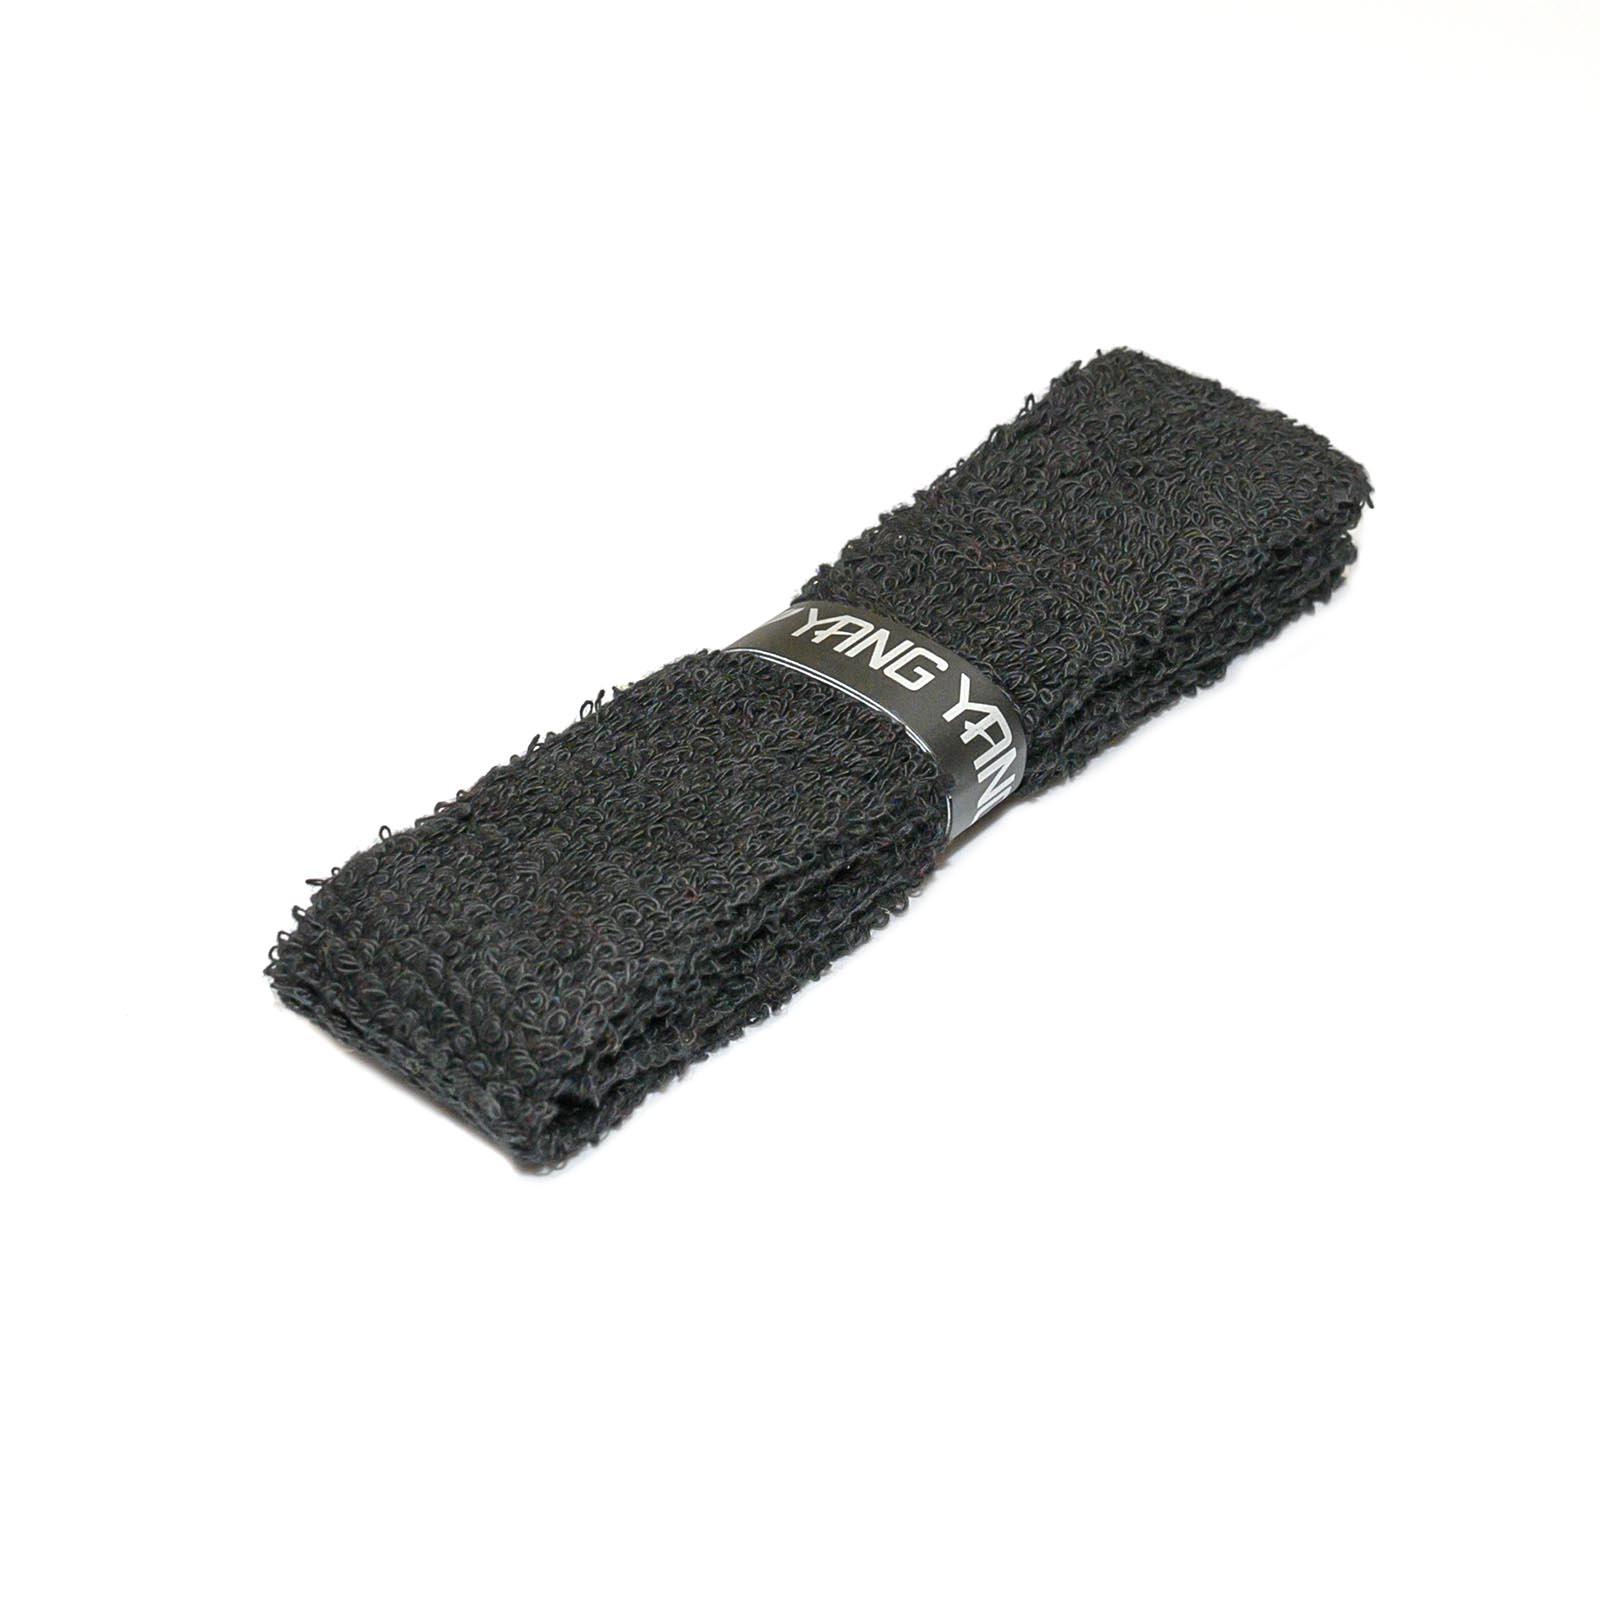 https://www.badec.store/produkty_img/badmintonova-omotavka1570723250L.jpg